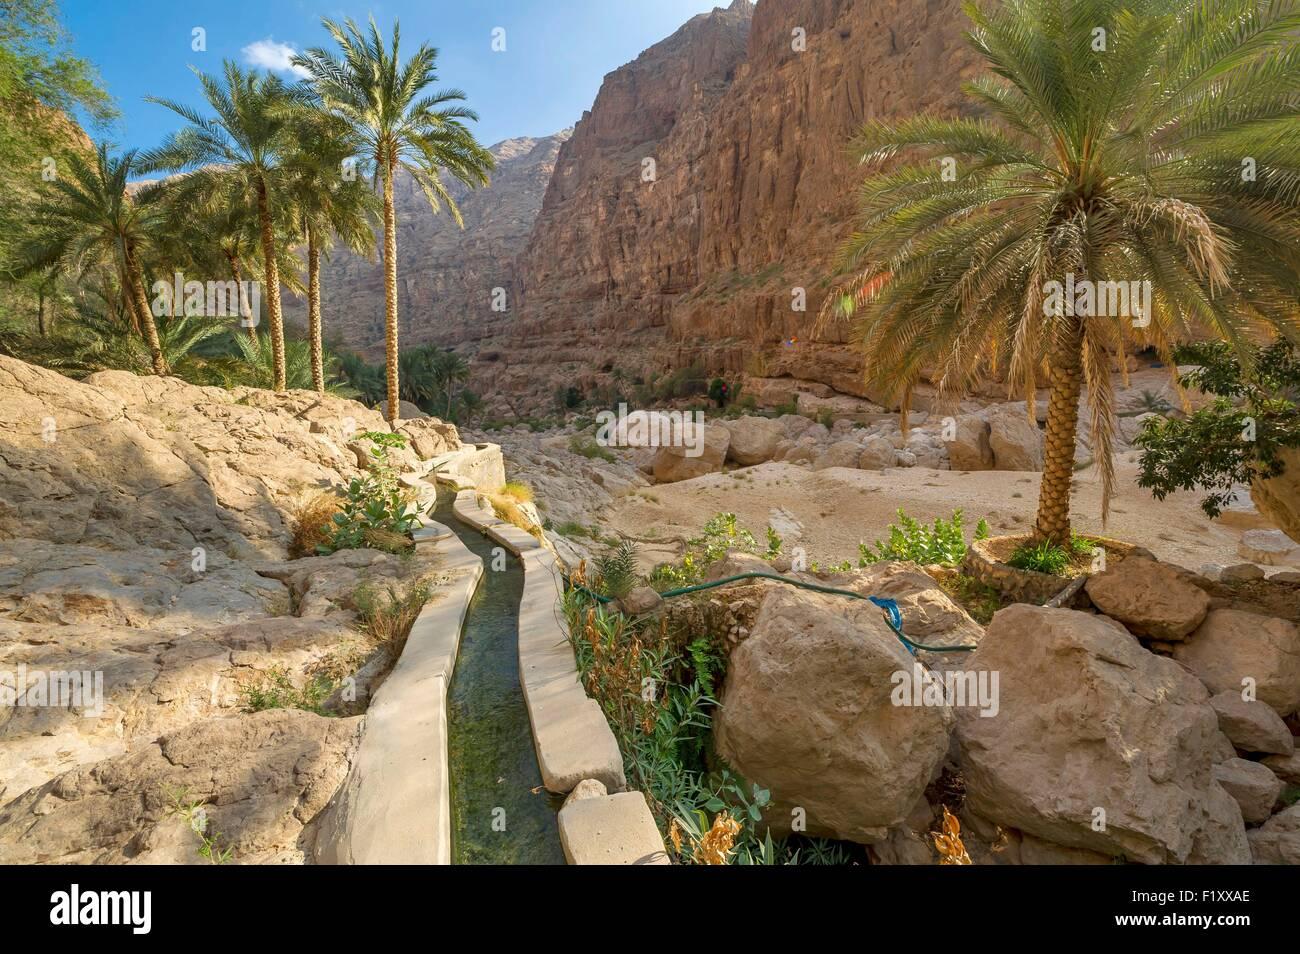 Oman, Wadi Shab, falaj, ou canal d'irrigation Photo Stock